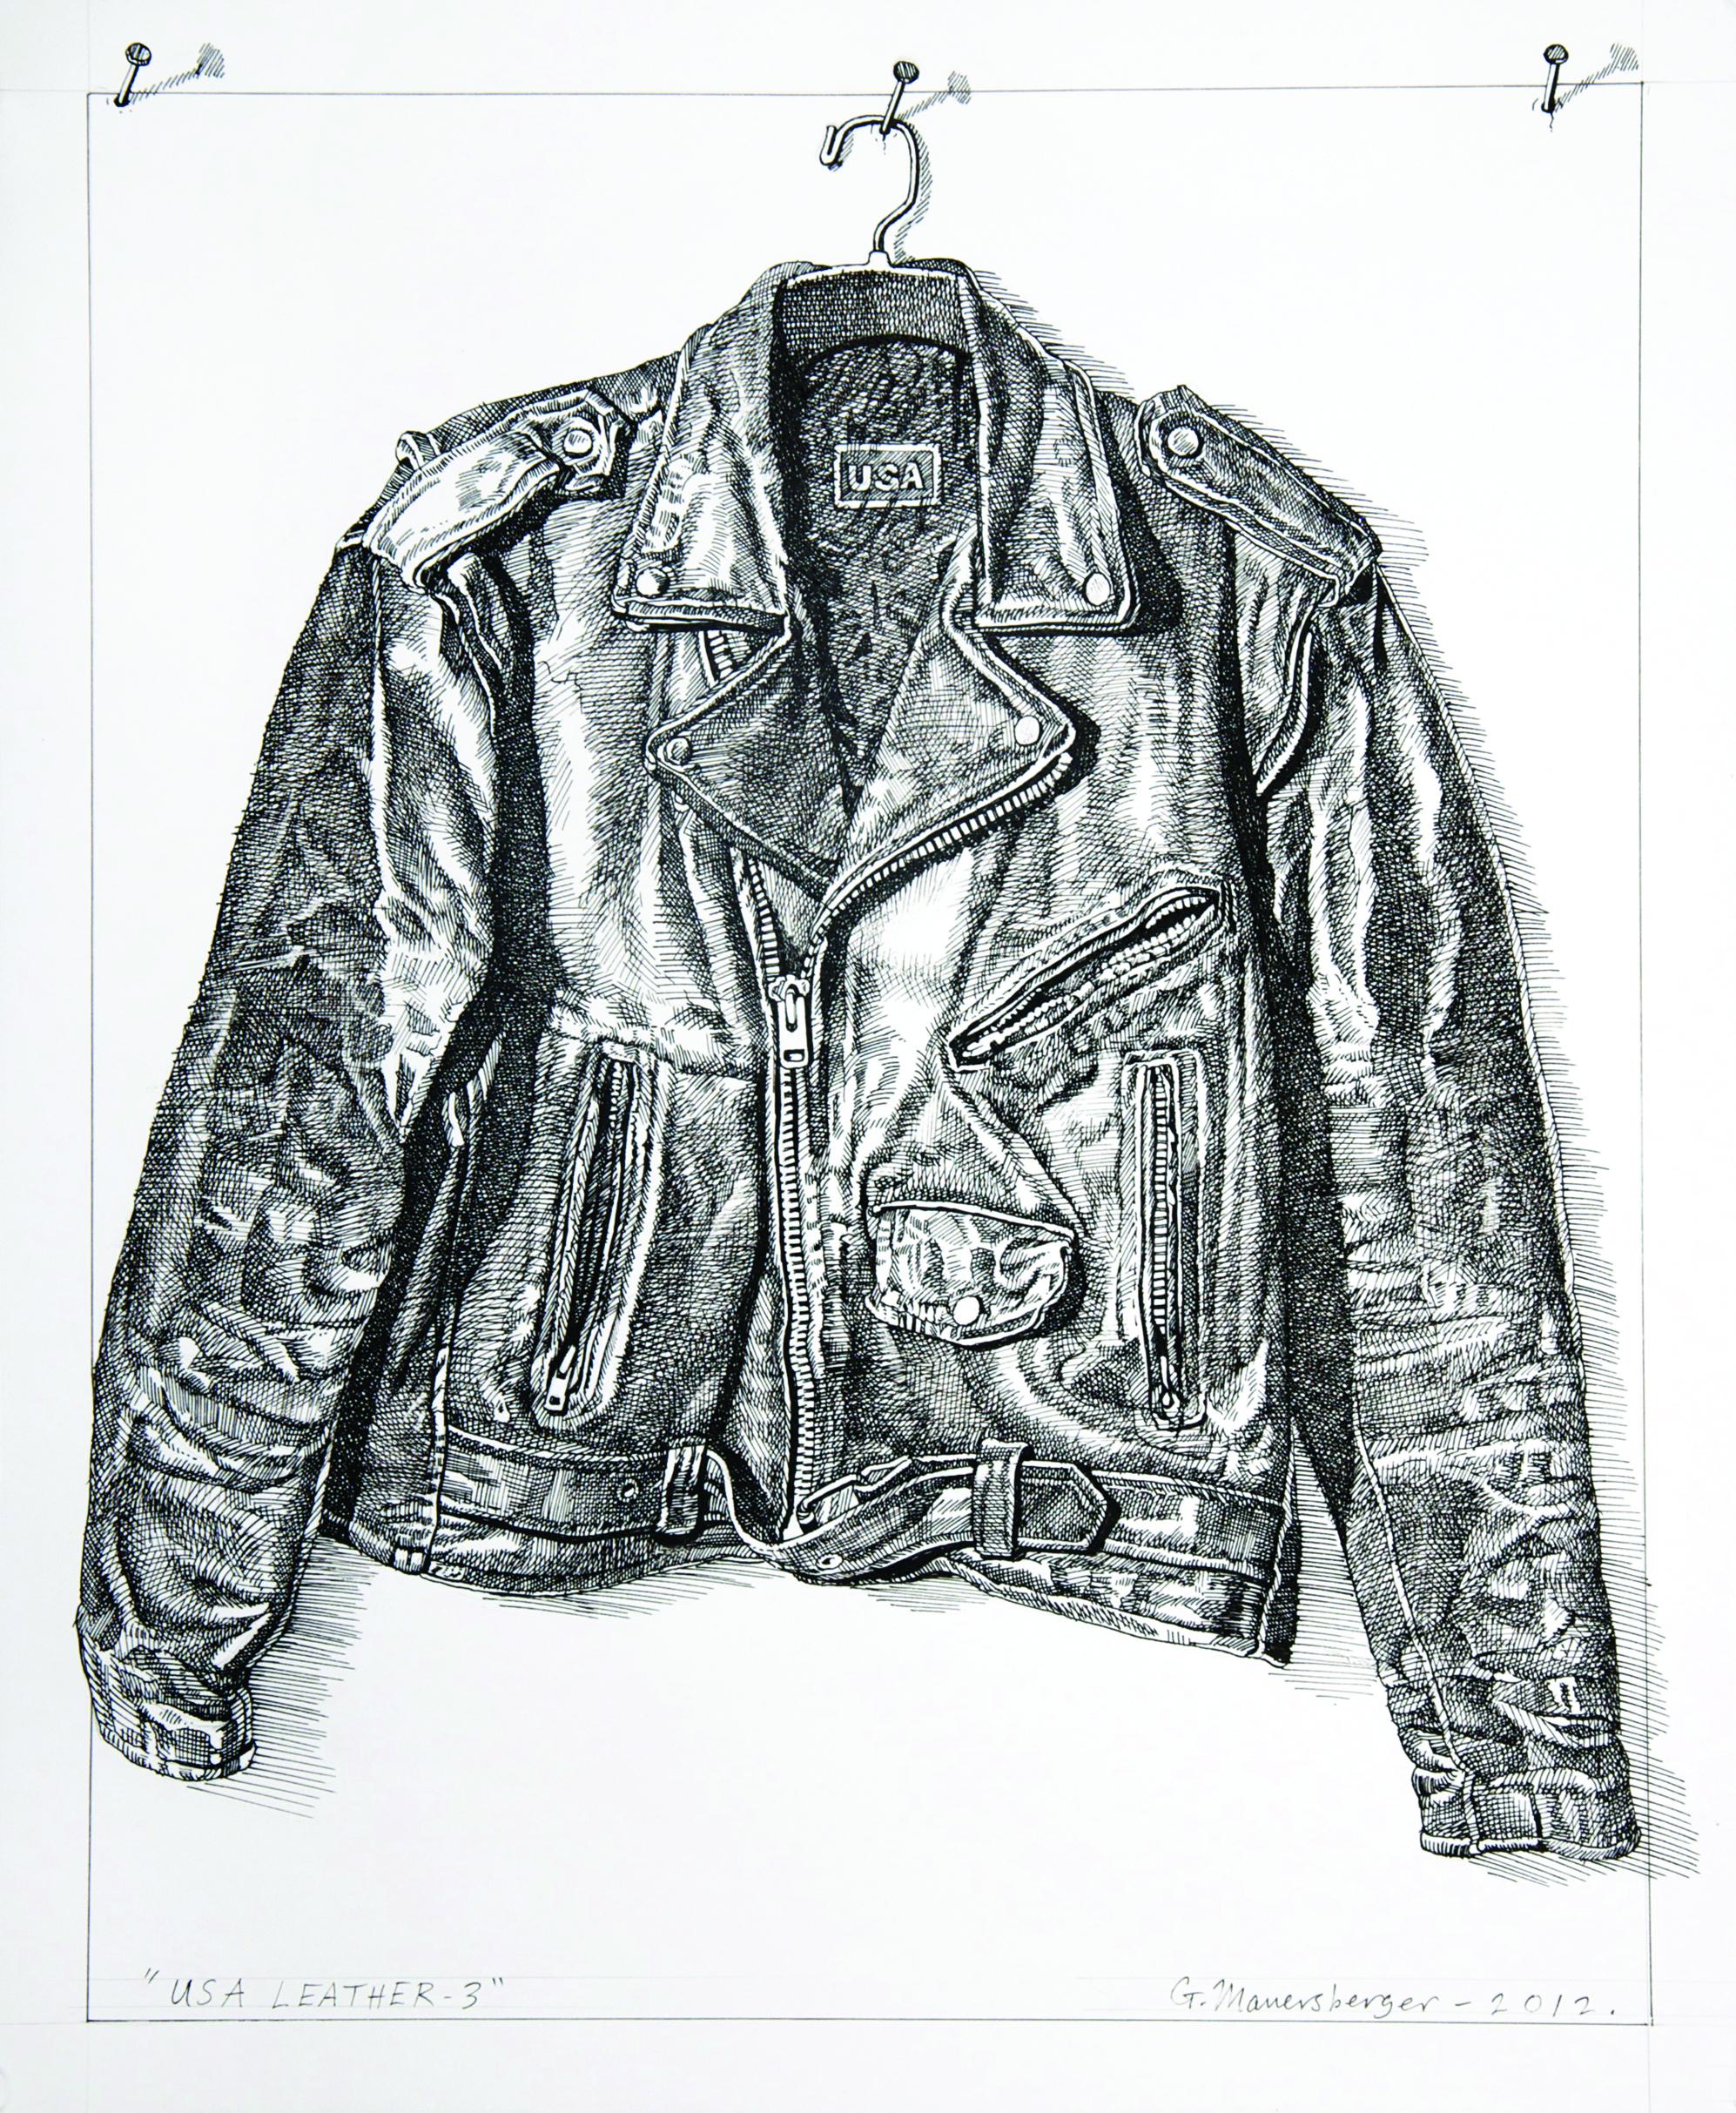 USA Leather 3